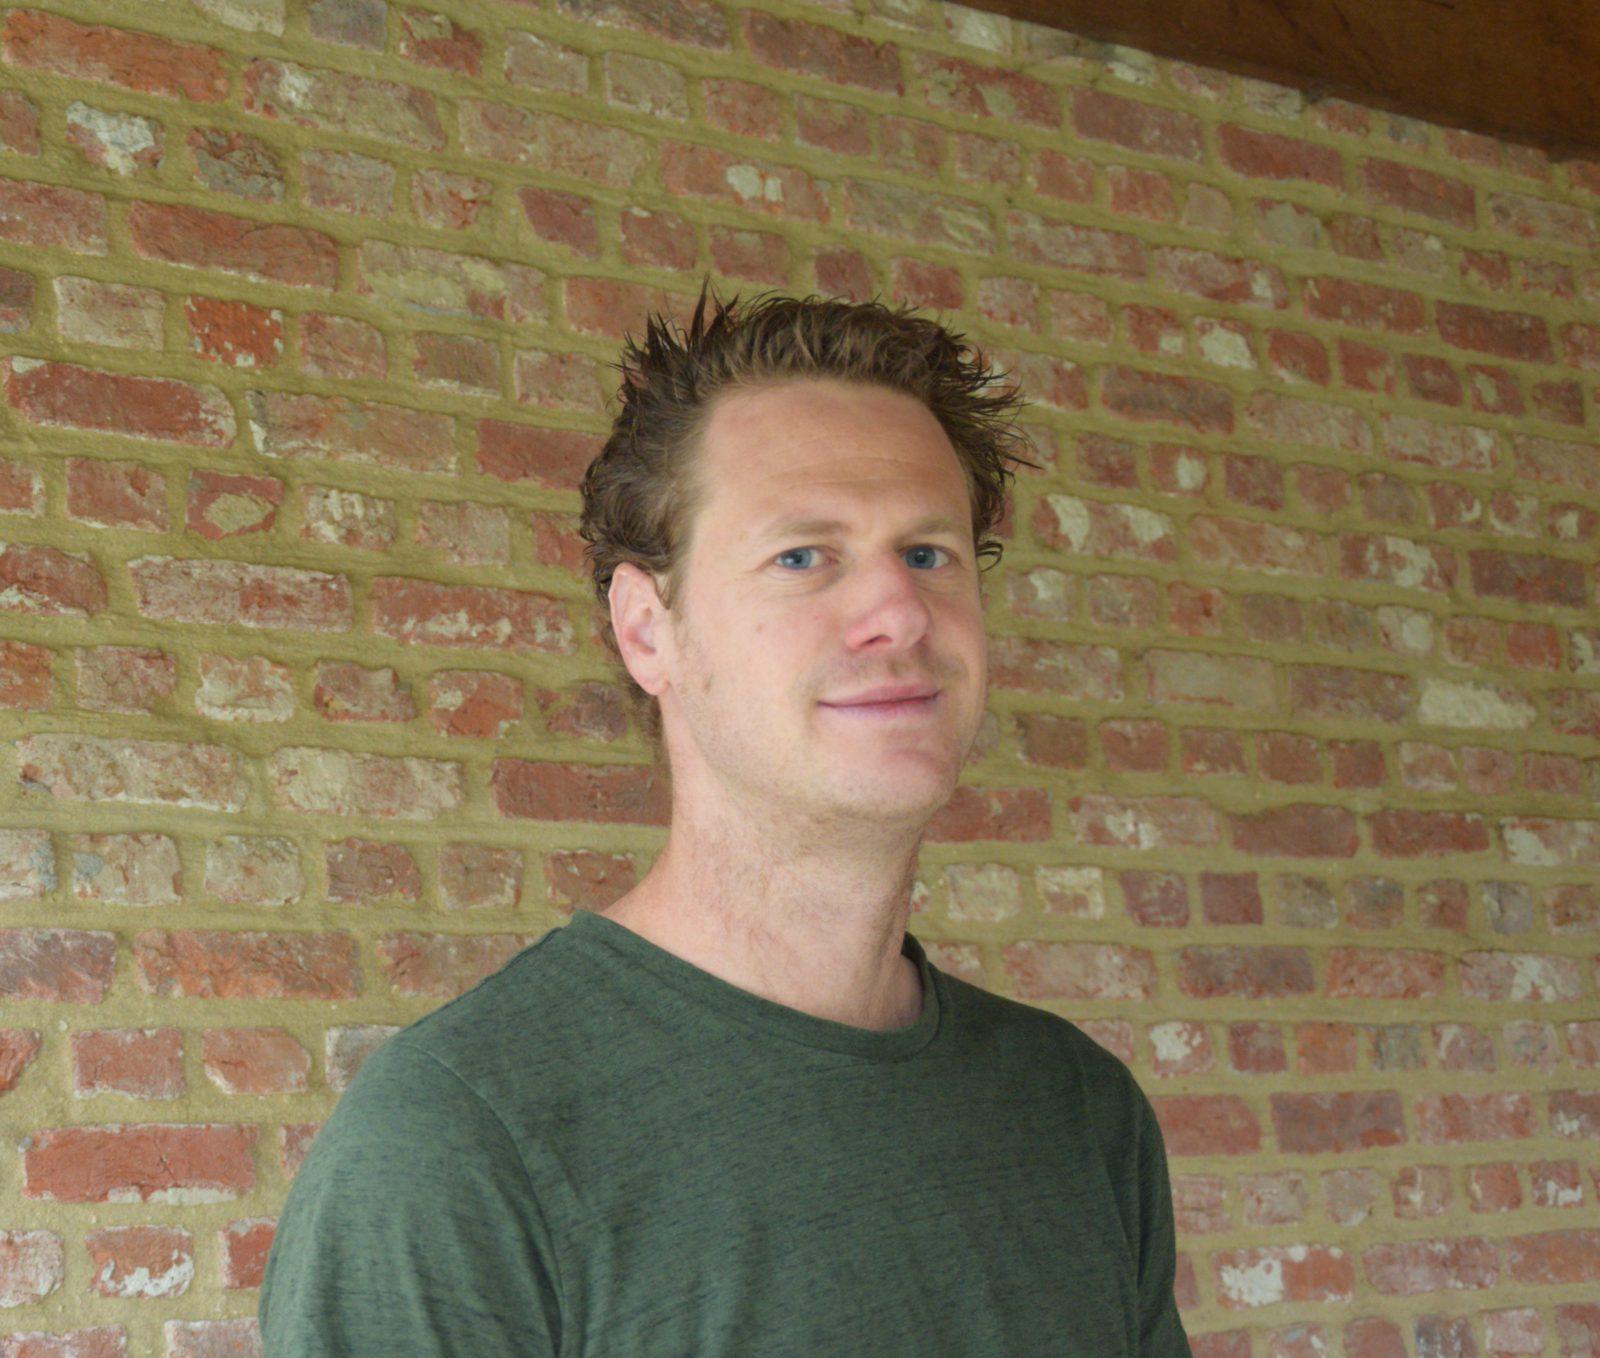 Michael Niclaus